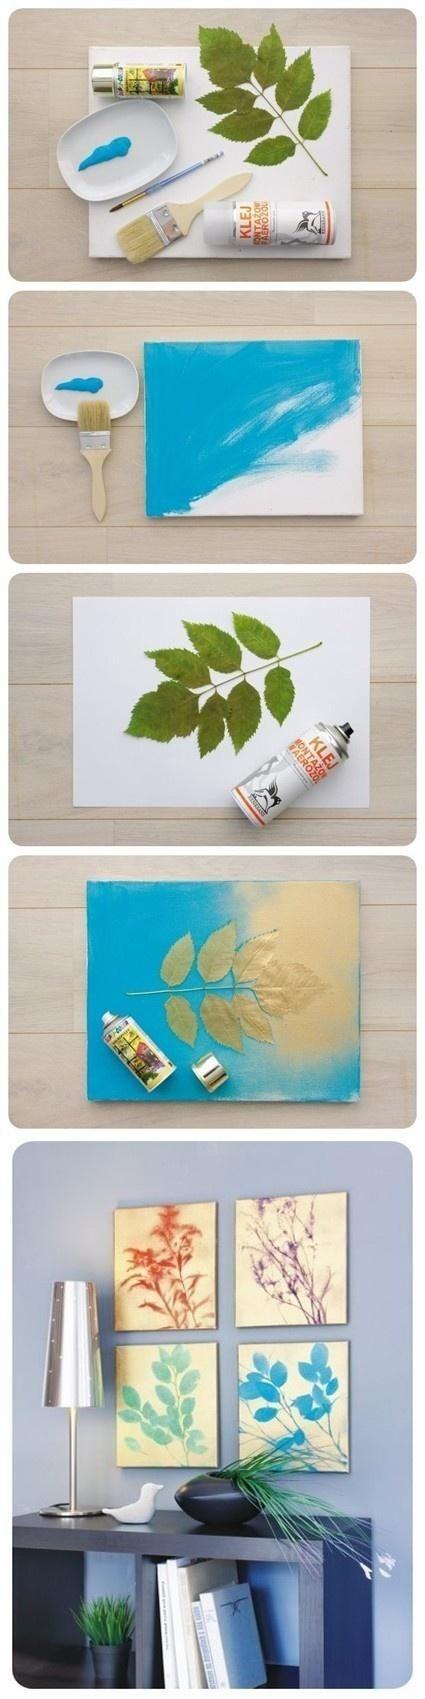 Diy Spray Paint Plant Pictures